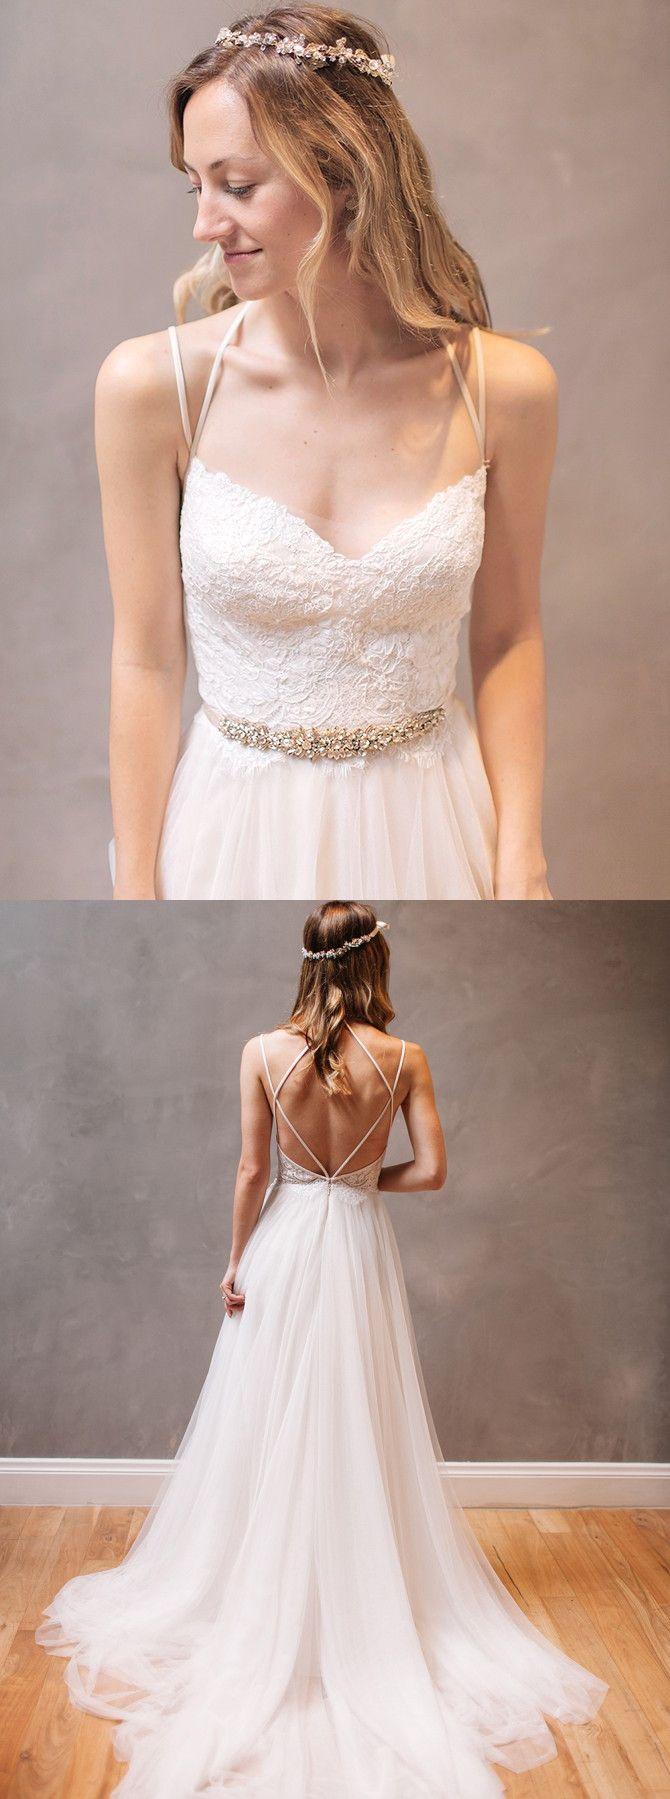 wedding dresseslace wedding dressesbackless wedding dresses